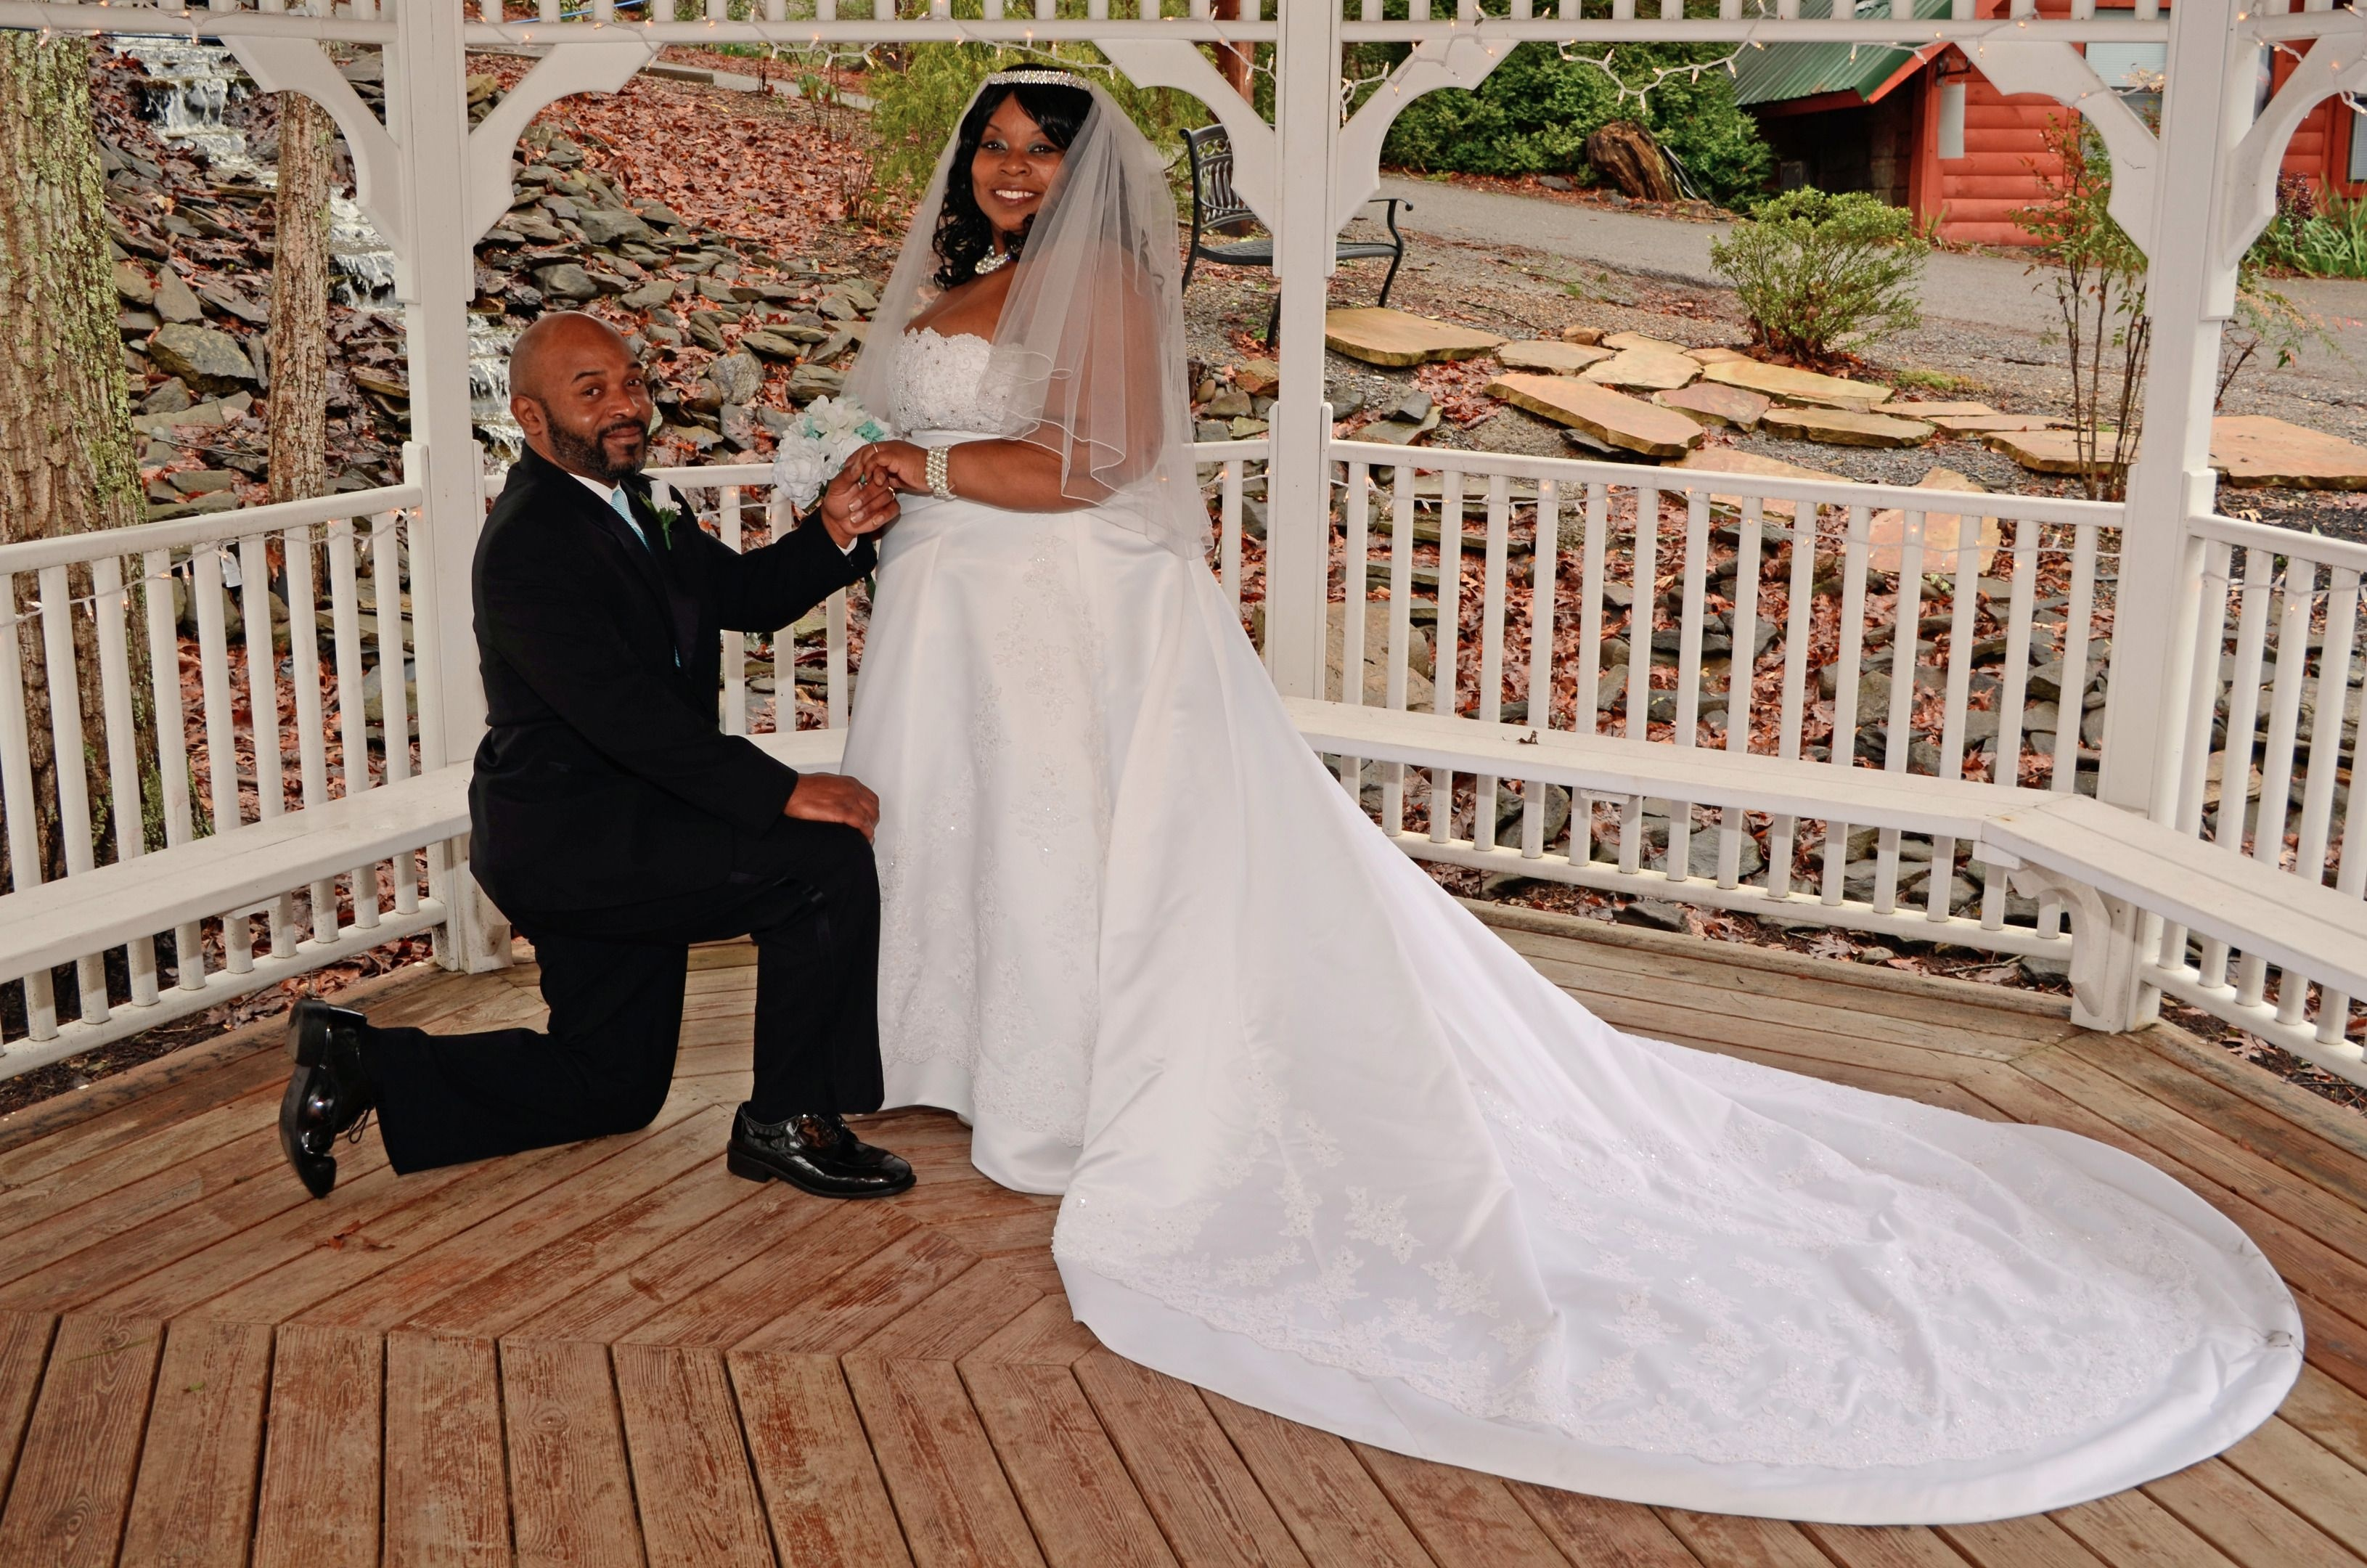 Wedding Chapel at Honeymoon Hills, Gatlinburg Wedding Chapel image 17